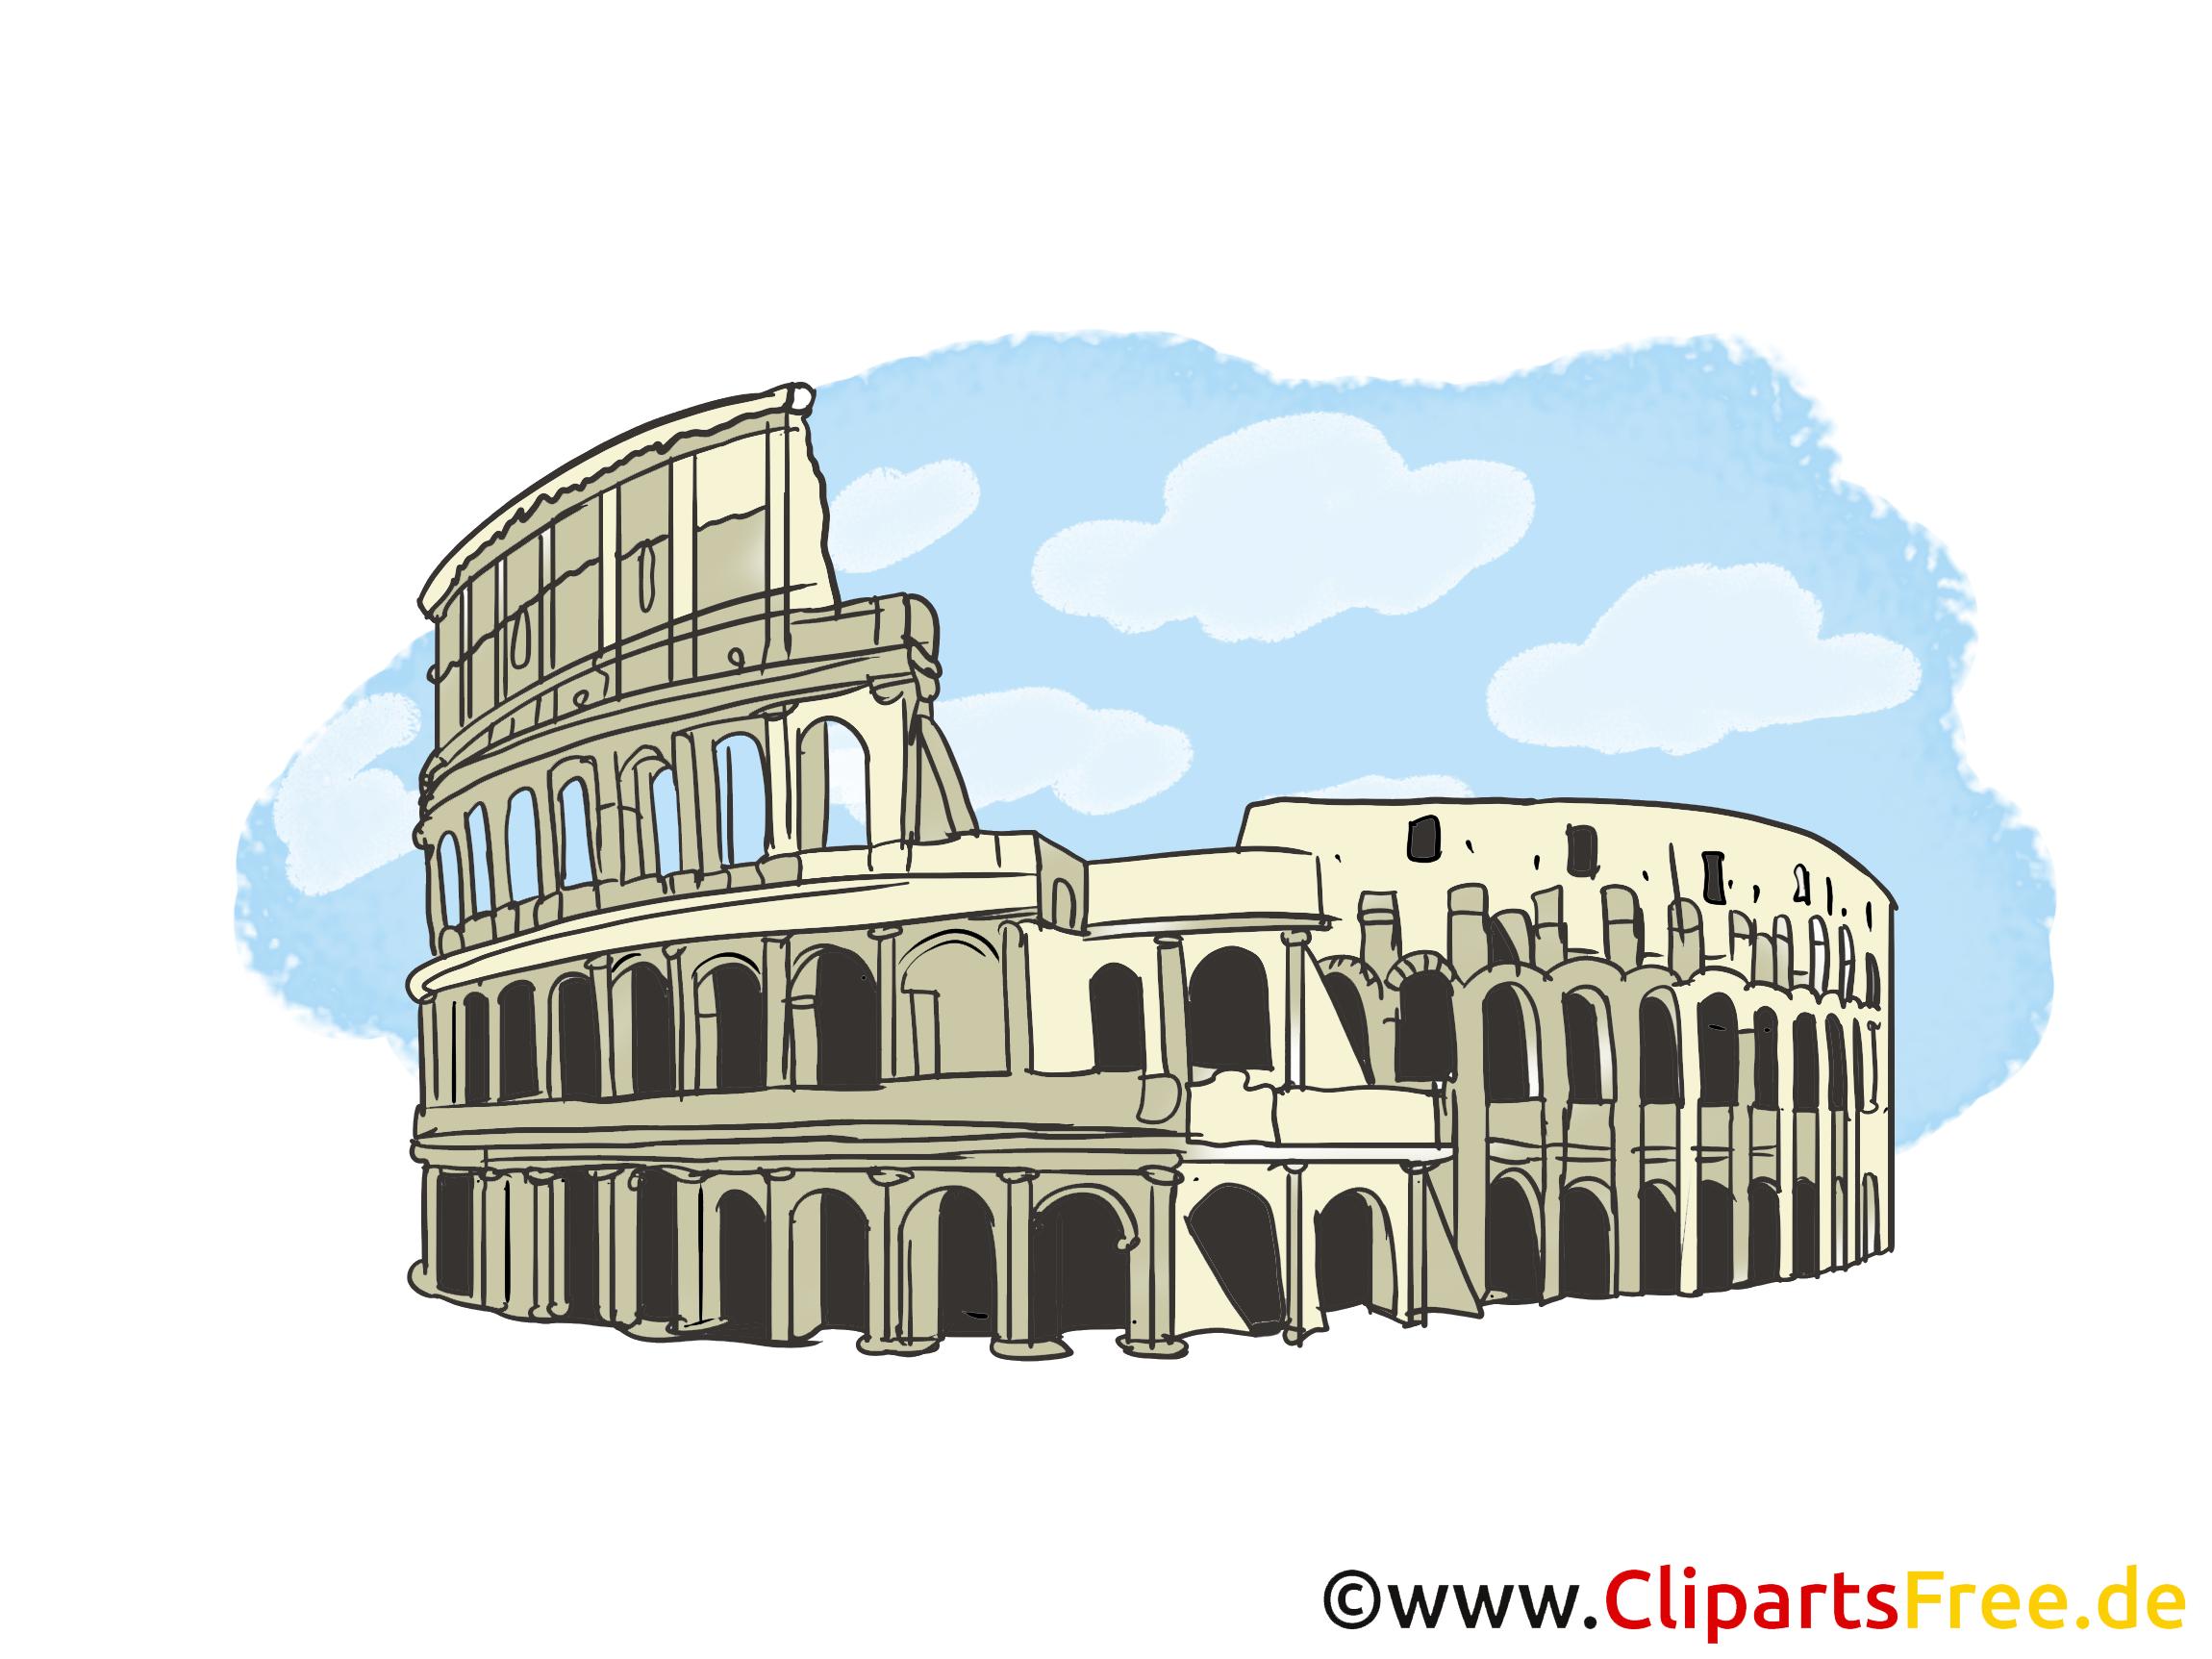 Cliparts rom kostenlos